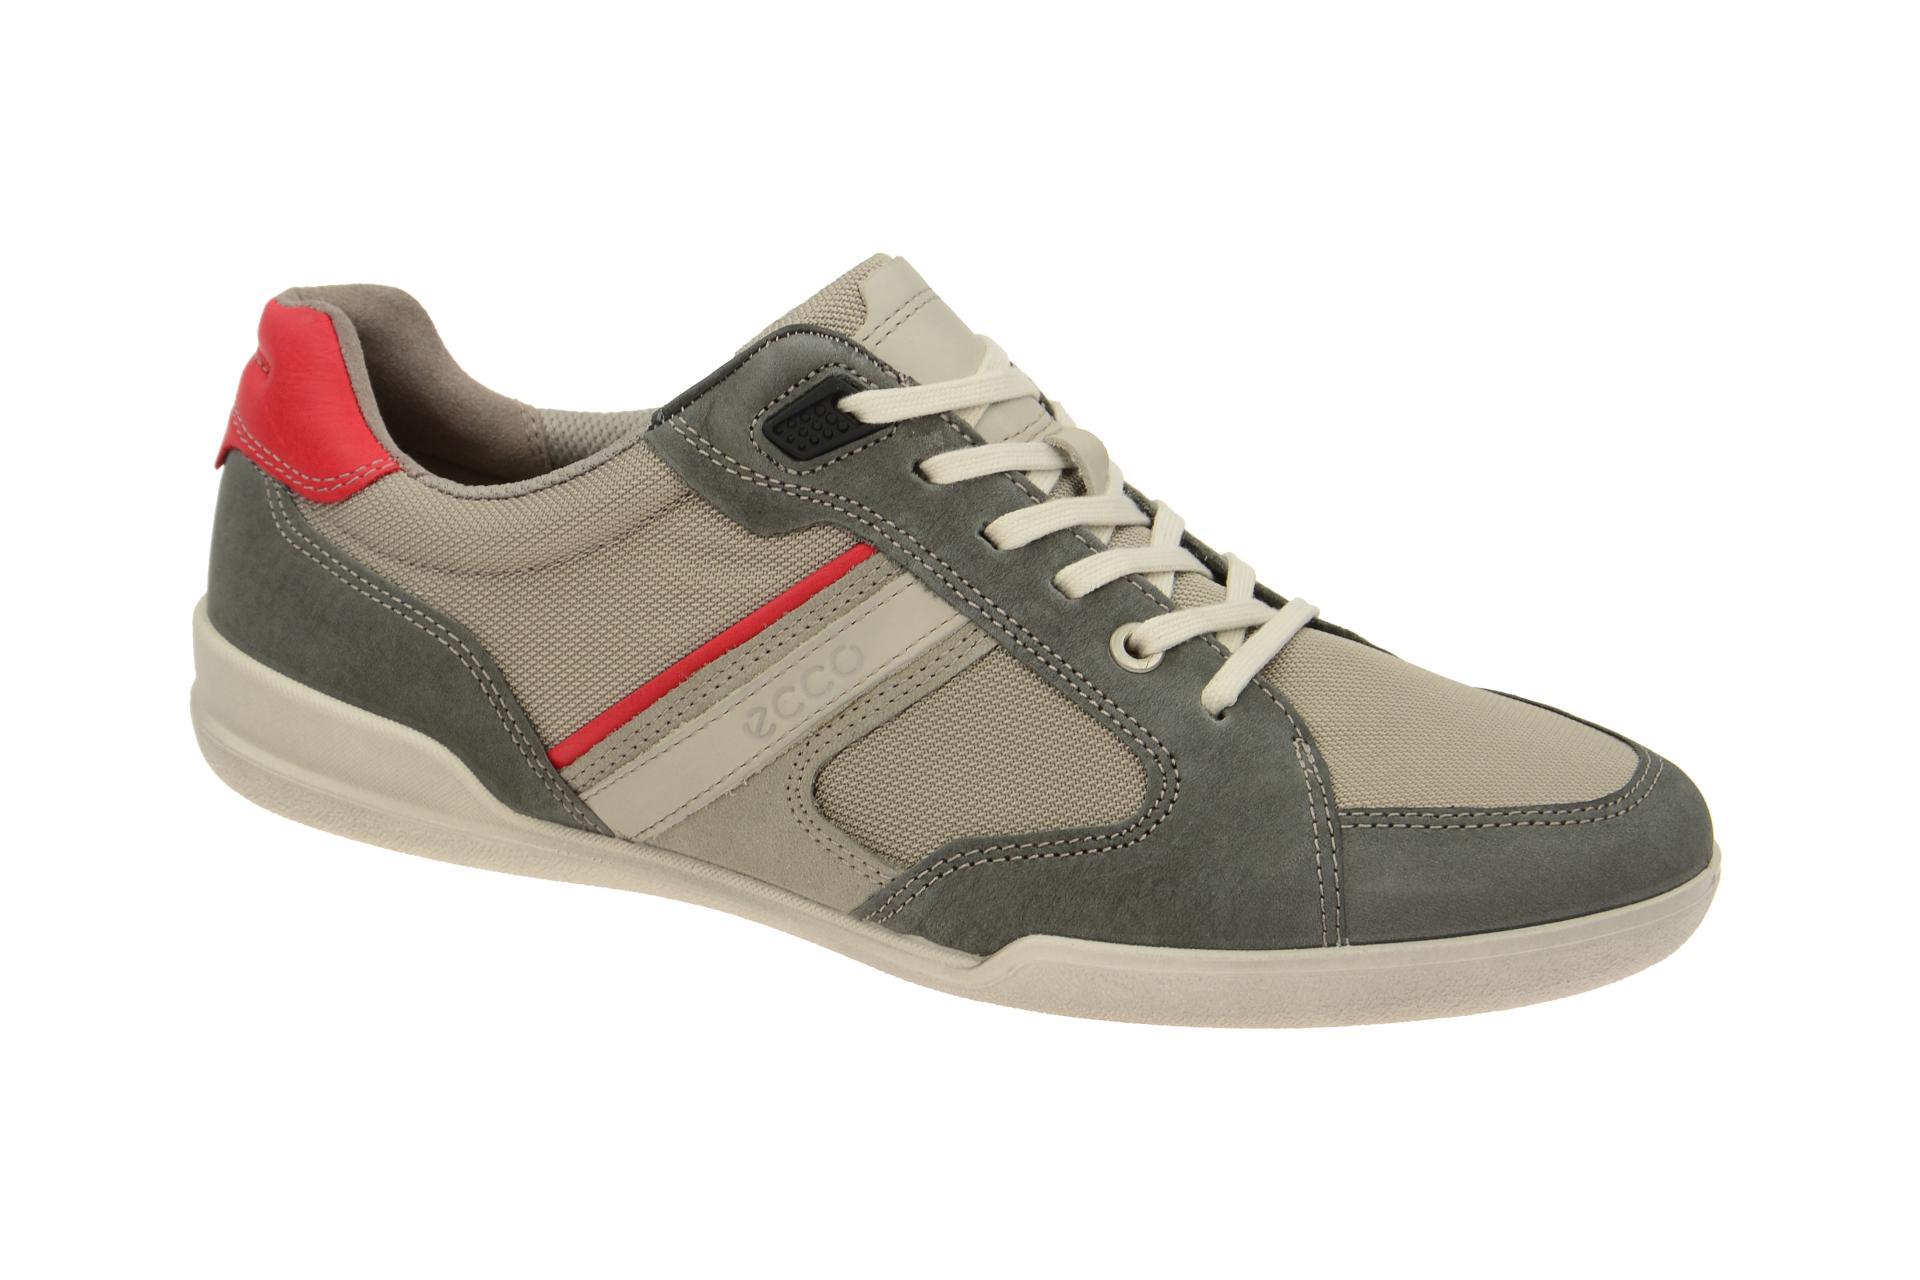 34f4e551c4c6bb Ecco Enrico Schuhe grau mix Sneaker - Schuhhaus Strauch Shop